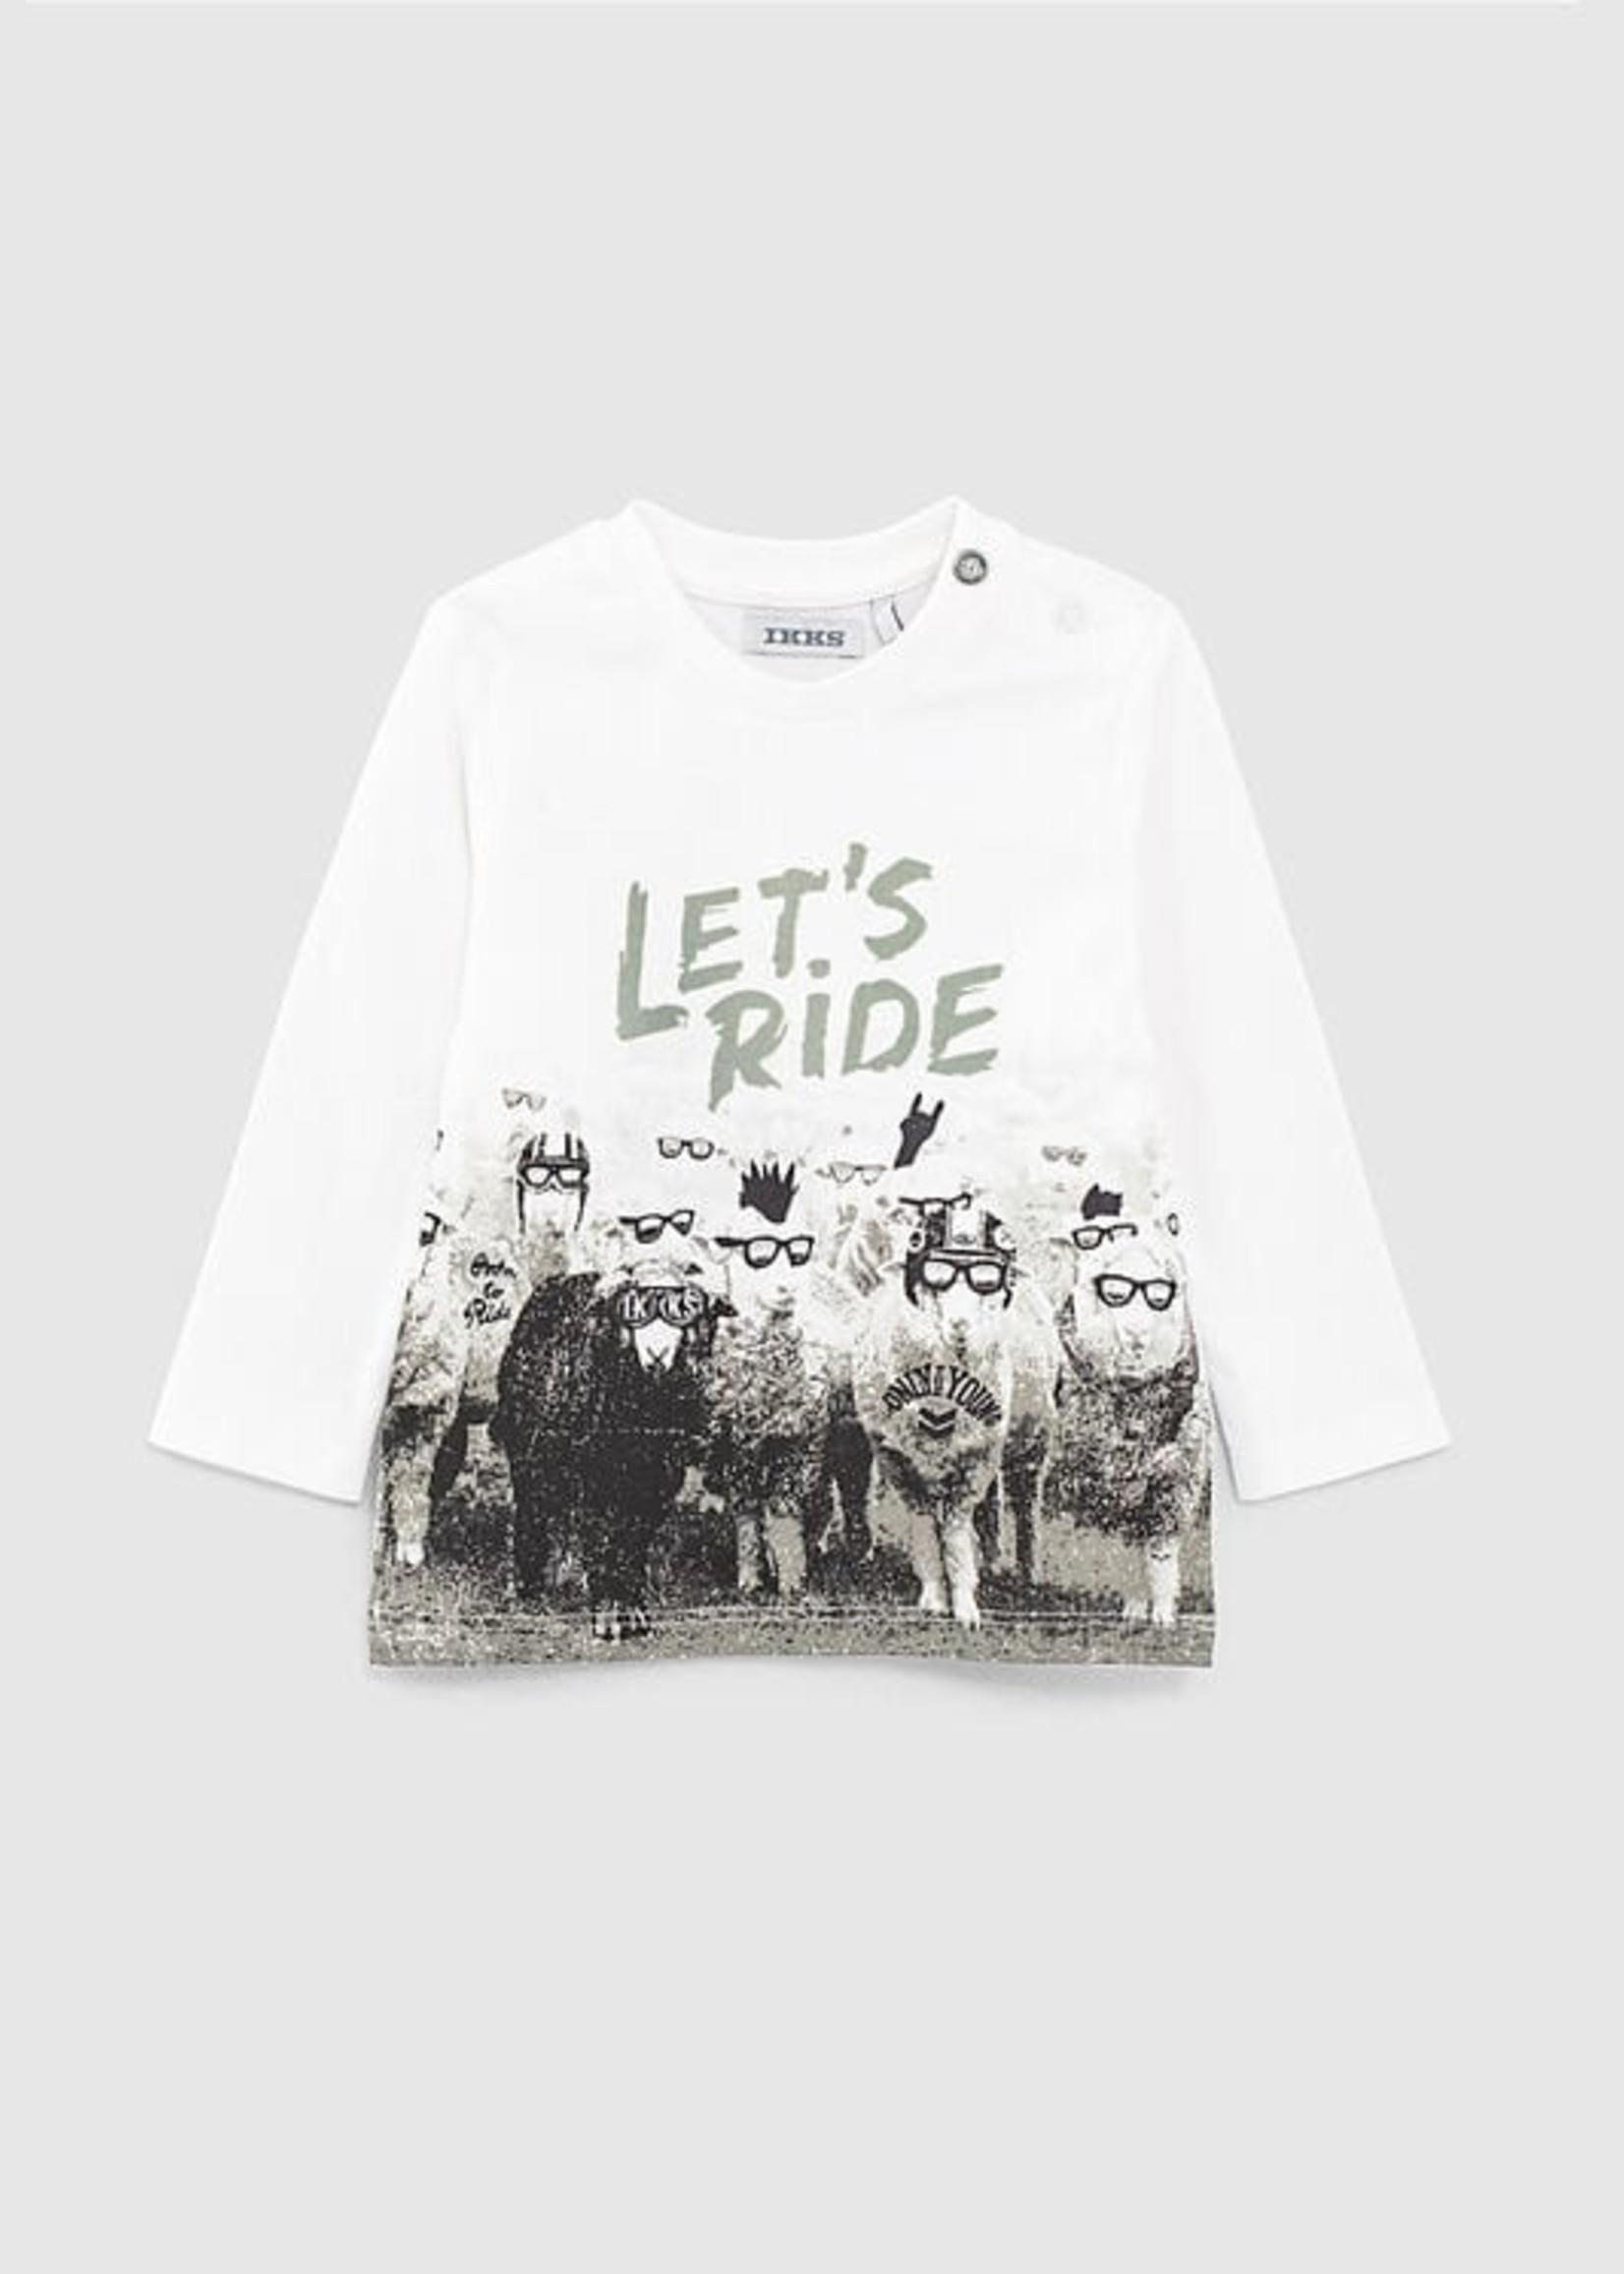 IKKS IKKS great escape t shirt